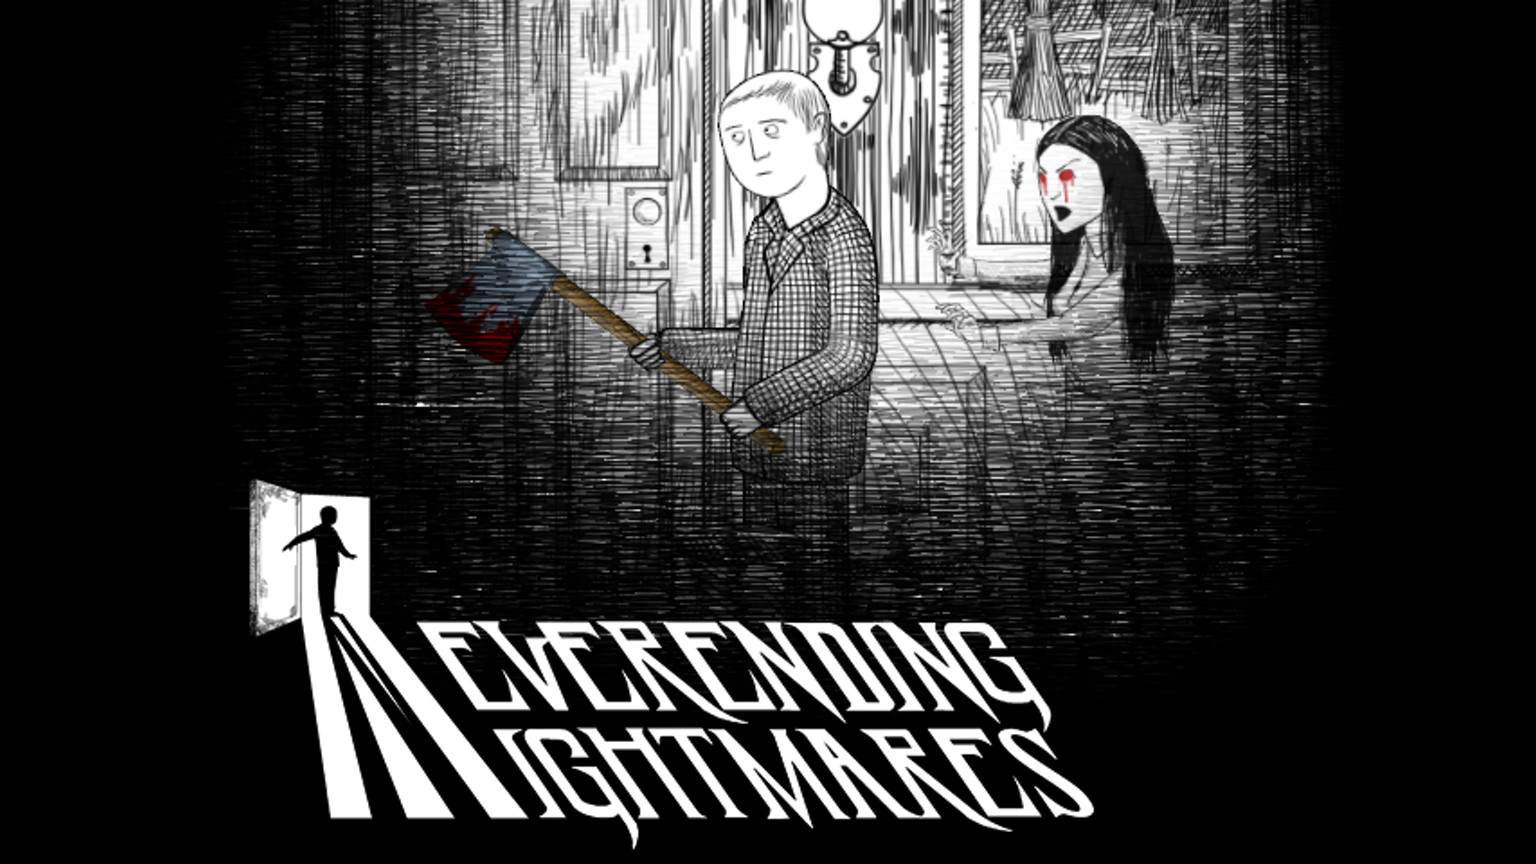 Joe Grabowski Neverending Nightmares